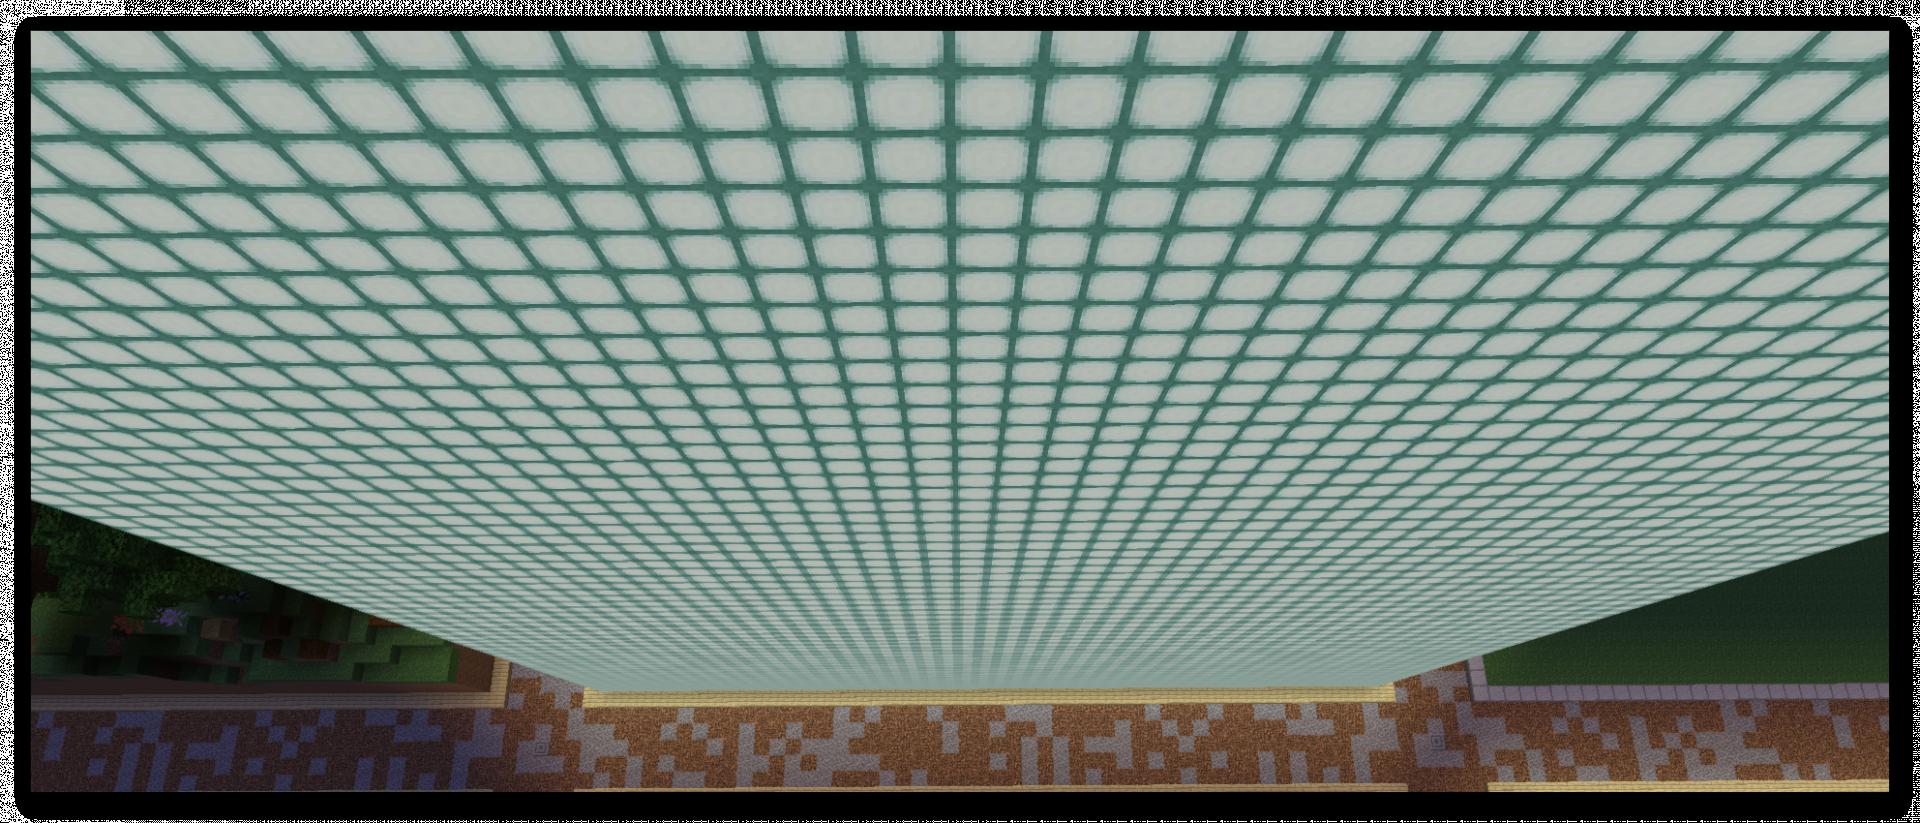 Ashampoo_Snap_Mittwoch, 24. Juni 2020_18h11m52s_001_Minecraft 1-14-4.png